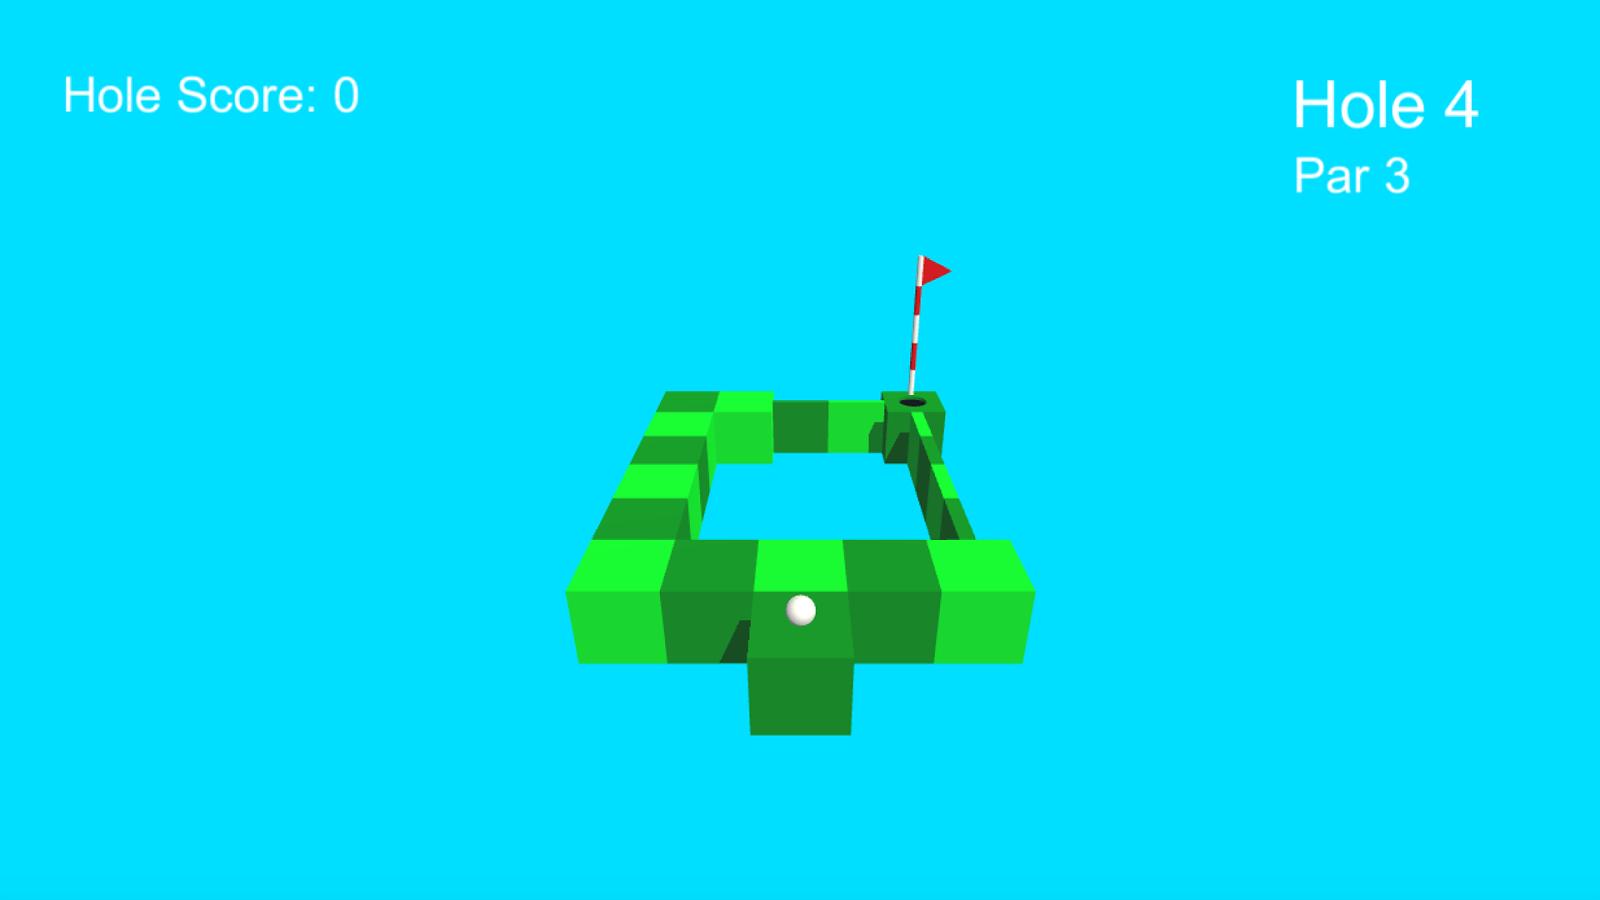 TipTap-Golf 17